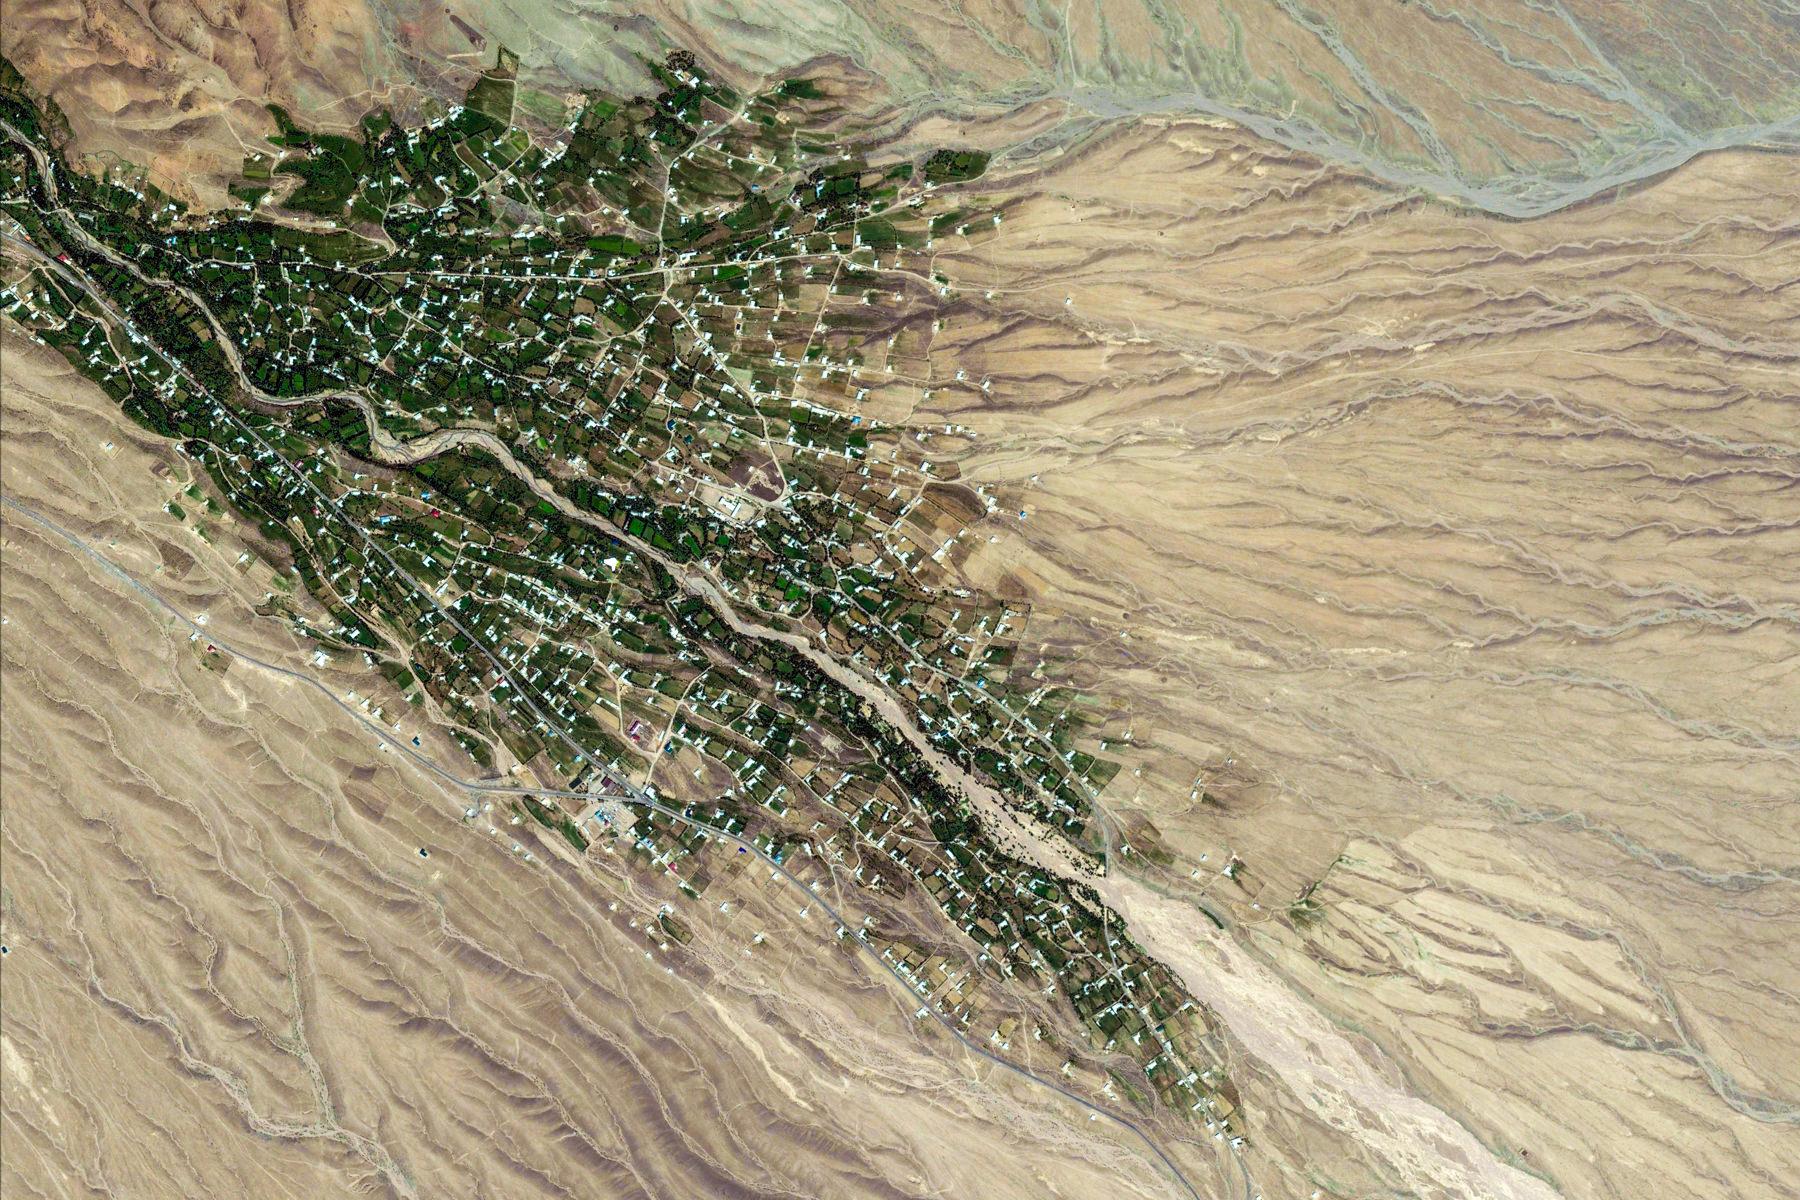 google-earth-Uzbekistan-PopDistrict-13261